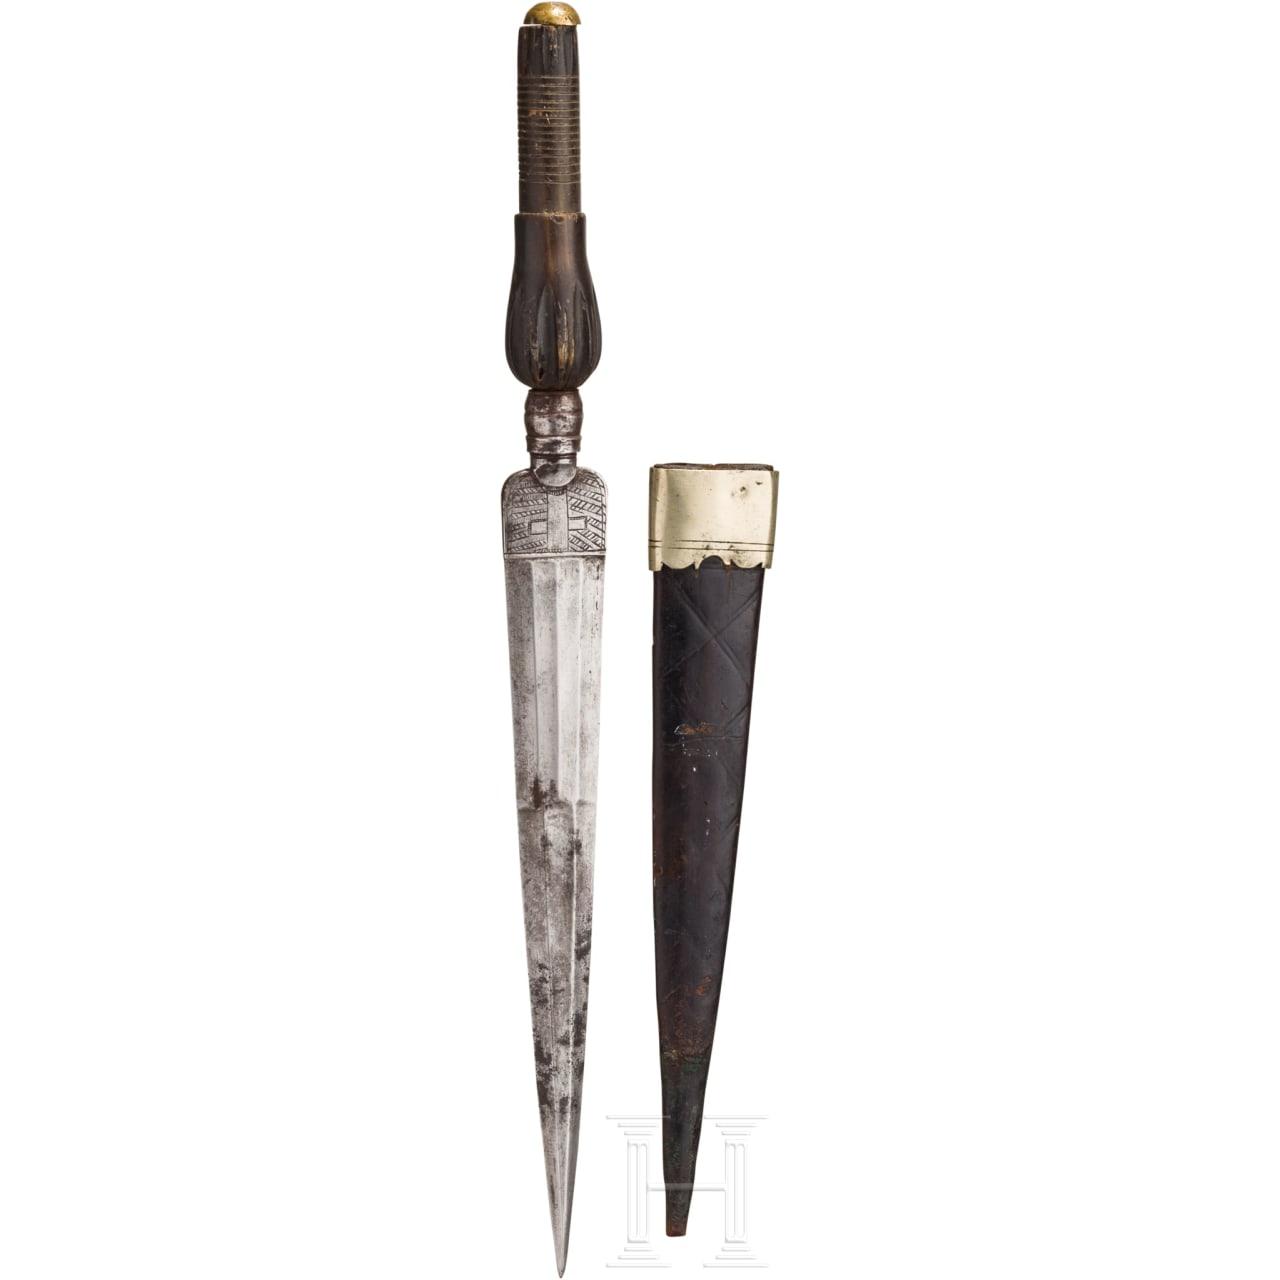 An Italian hunting plug bayonet, 18th century